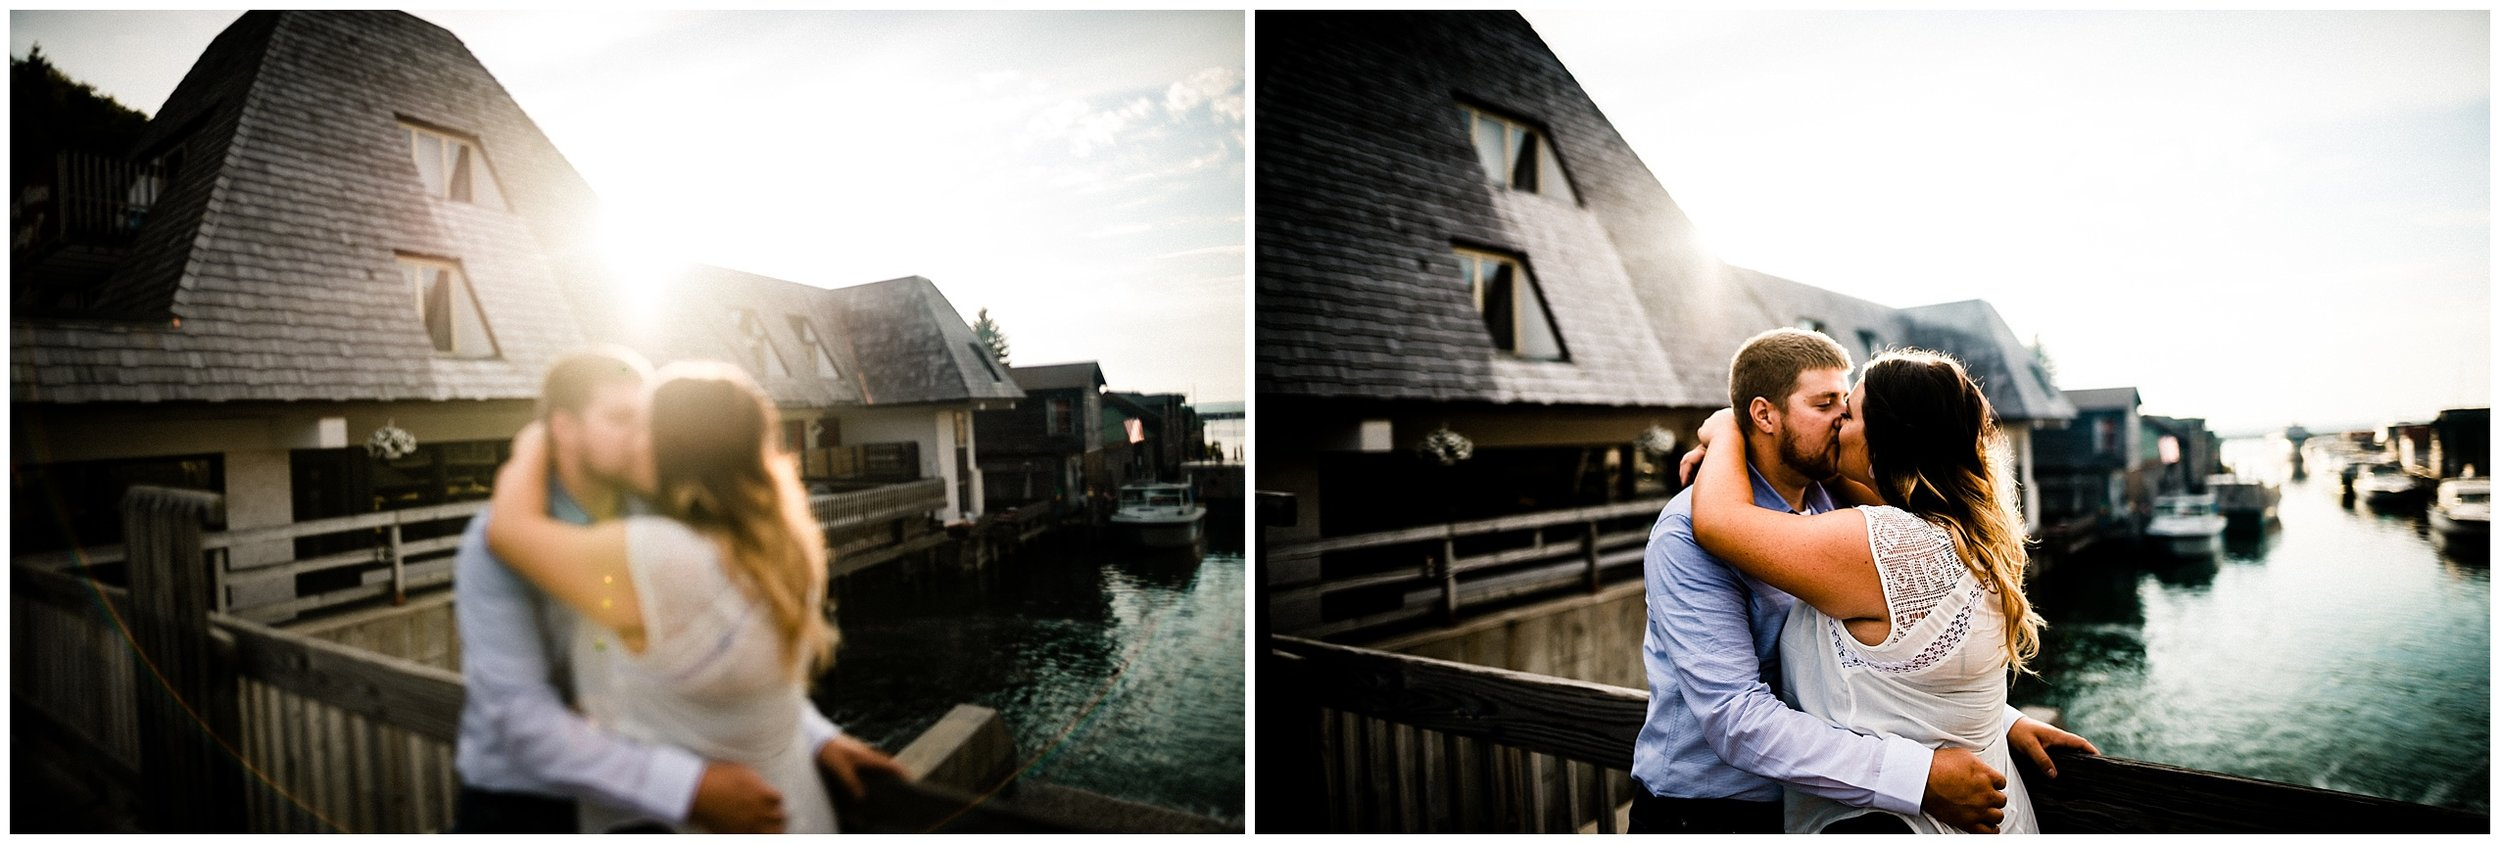 Kyle + Emily | Engaged #kyleepaigephotography_0502.jpg